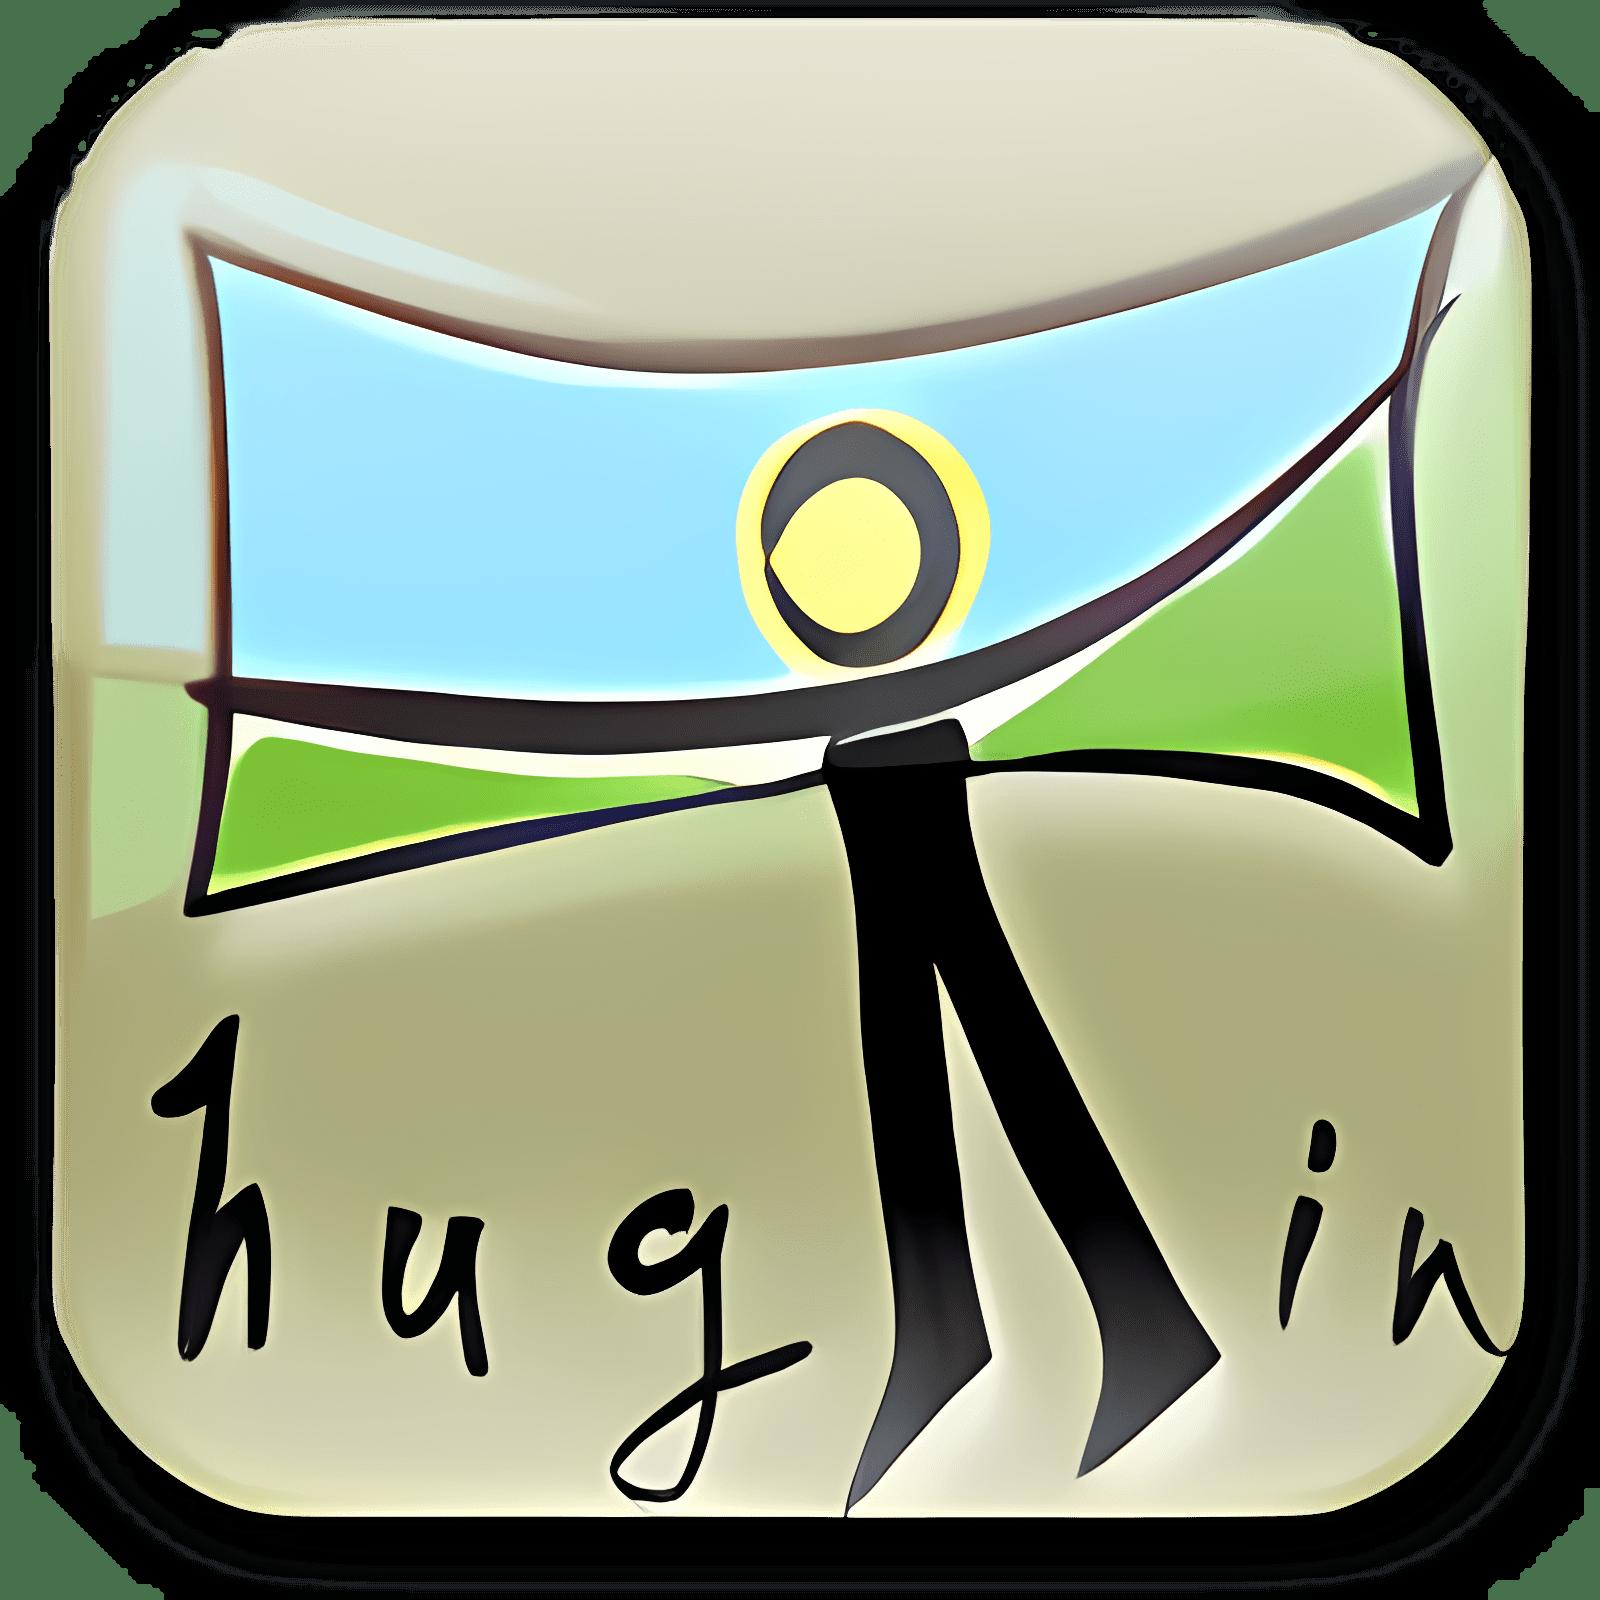 Hugin